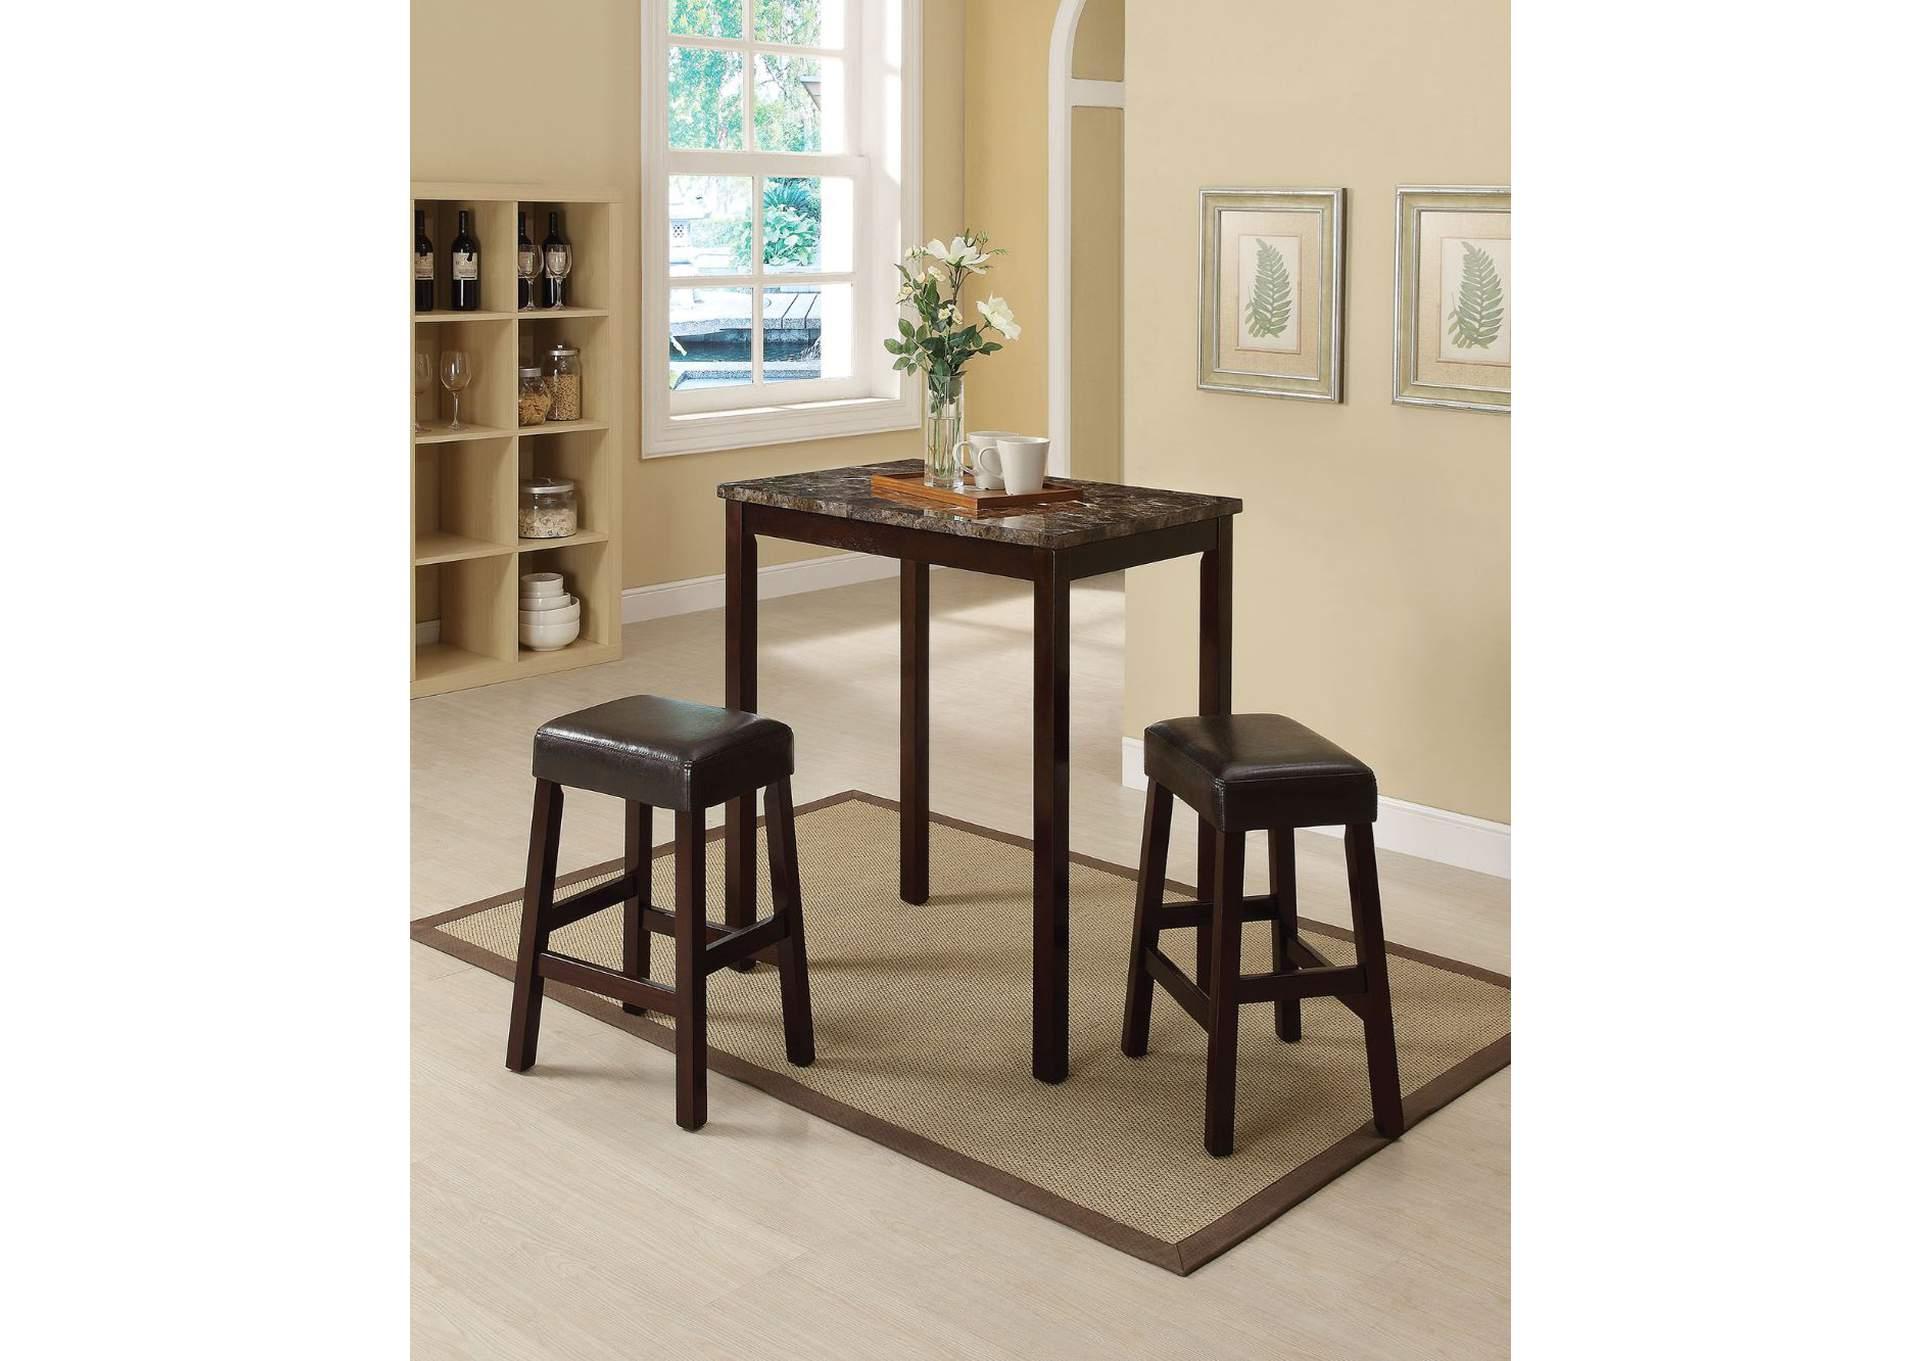 Superb Ace Furniture And Decor Idris Faux Marble Espresso Ibusinesslaw Wood Chair Design Ideas Ibusinesslaworg